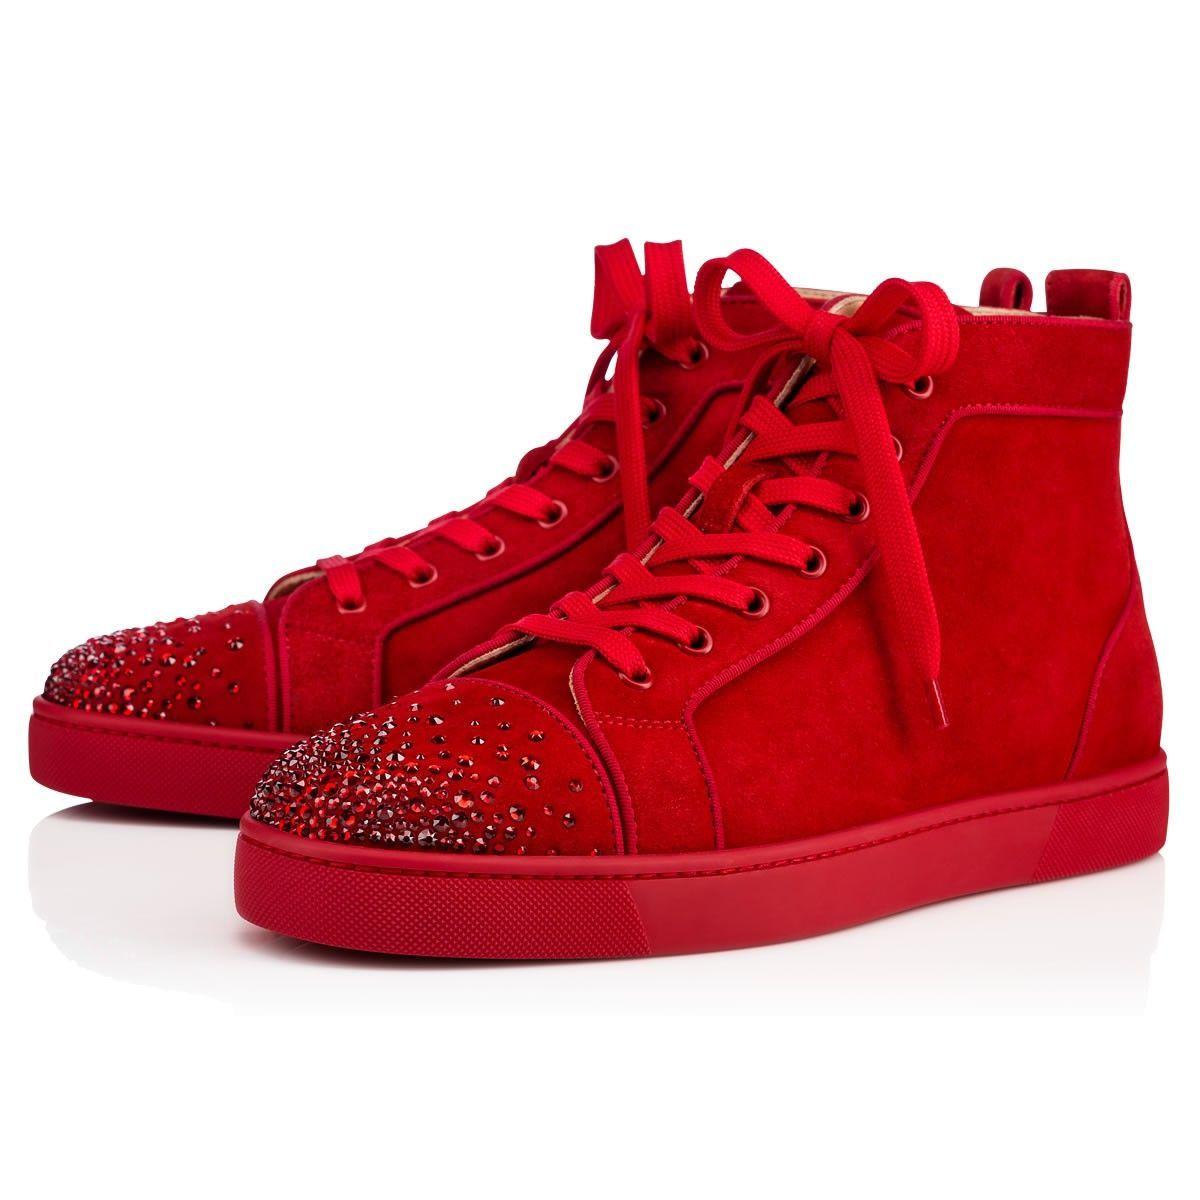 23d32f9b964 Shoes - Lou New Degra Flat - Christian Louboutin  ChristianLouboutin ...